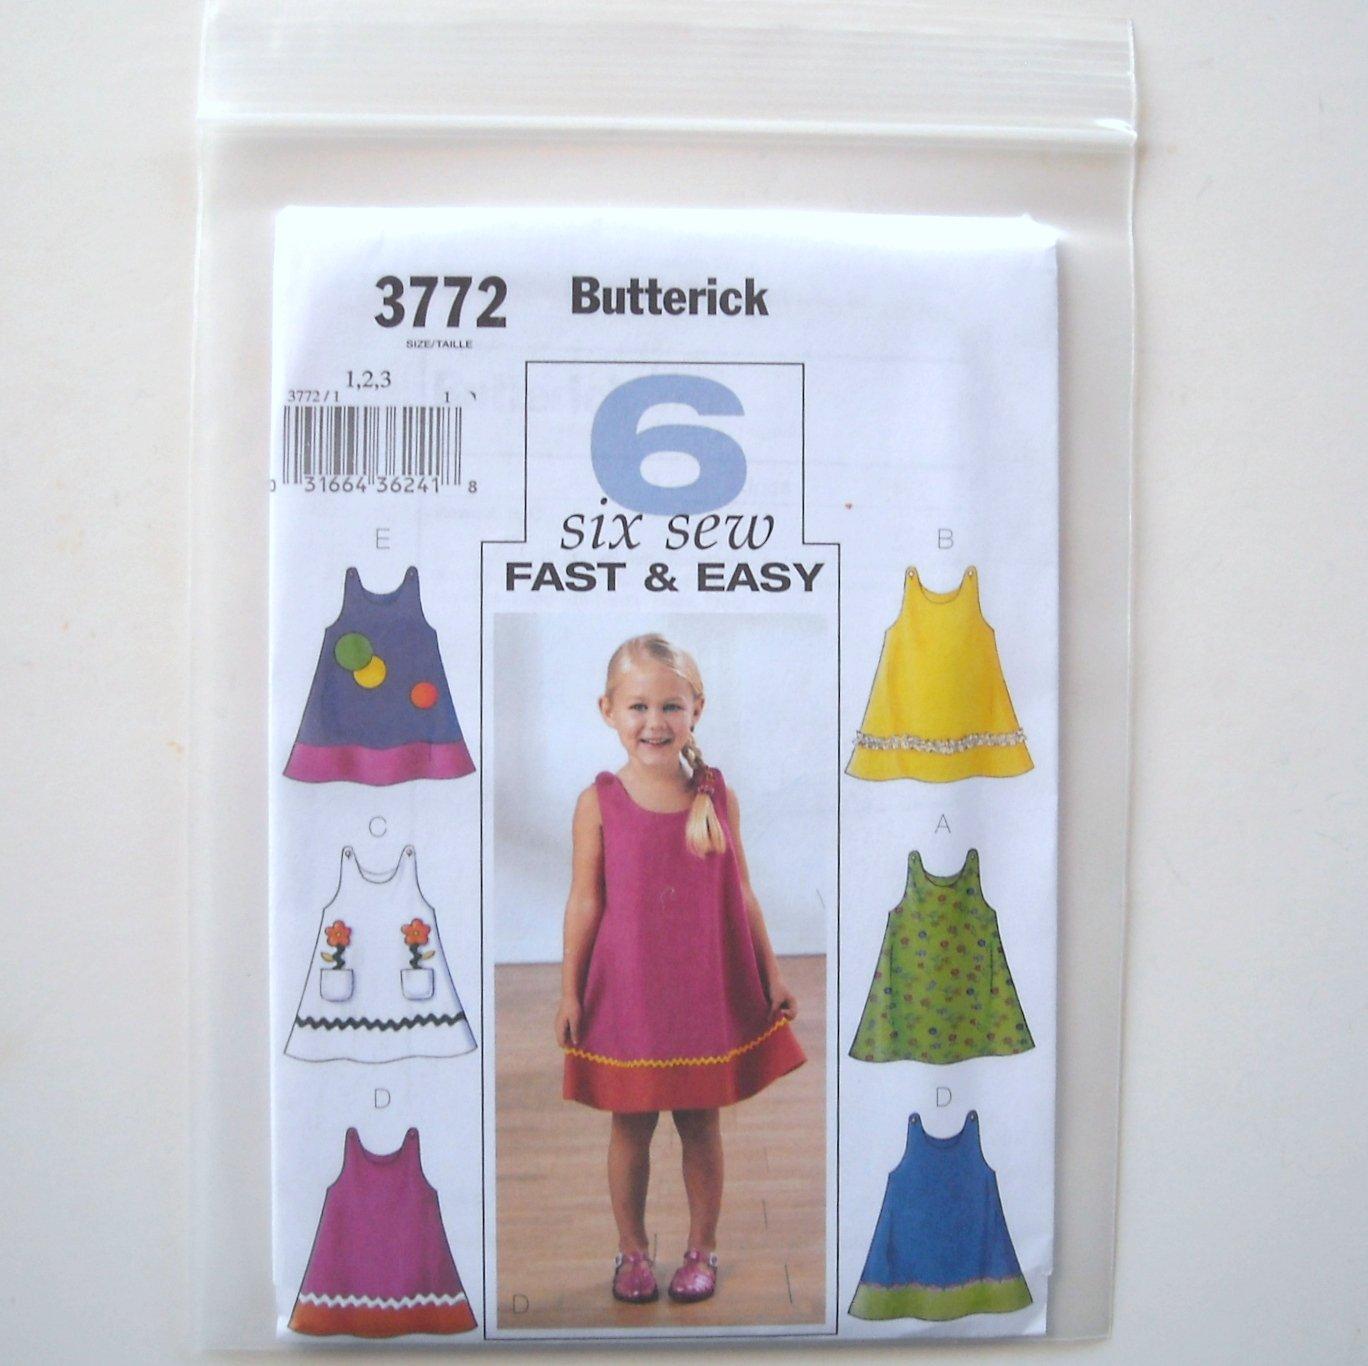 Butterick Pattern B3772 Size 1 - 3 Toddlers Childrens Girls Dress